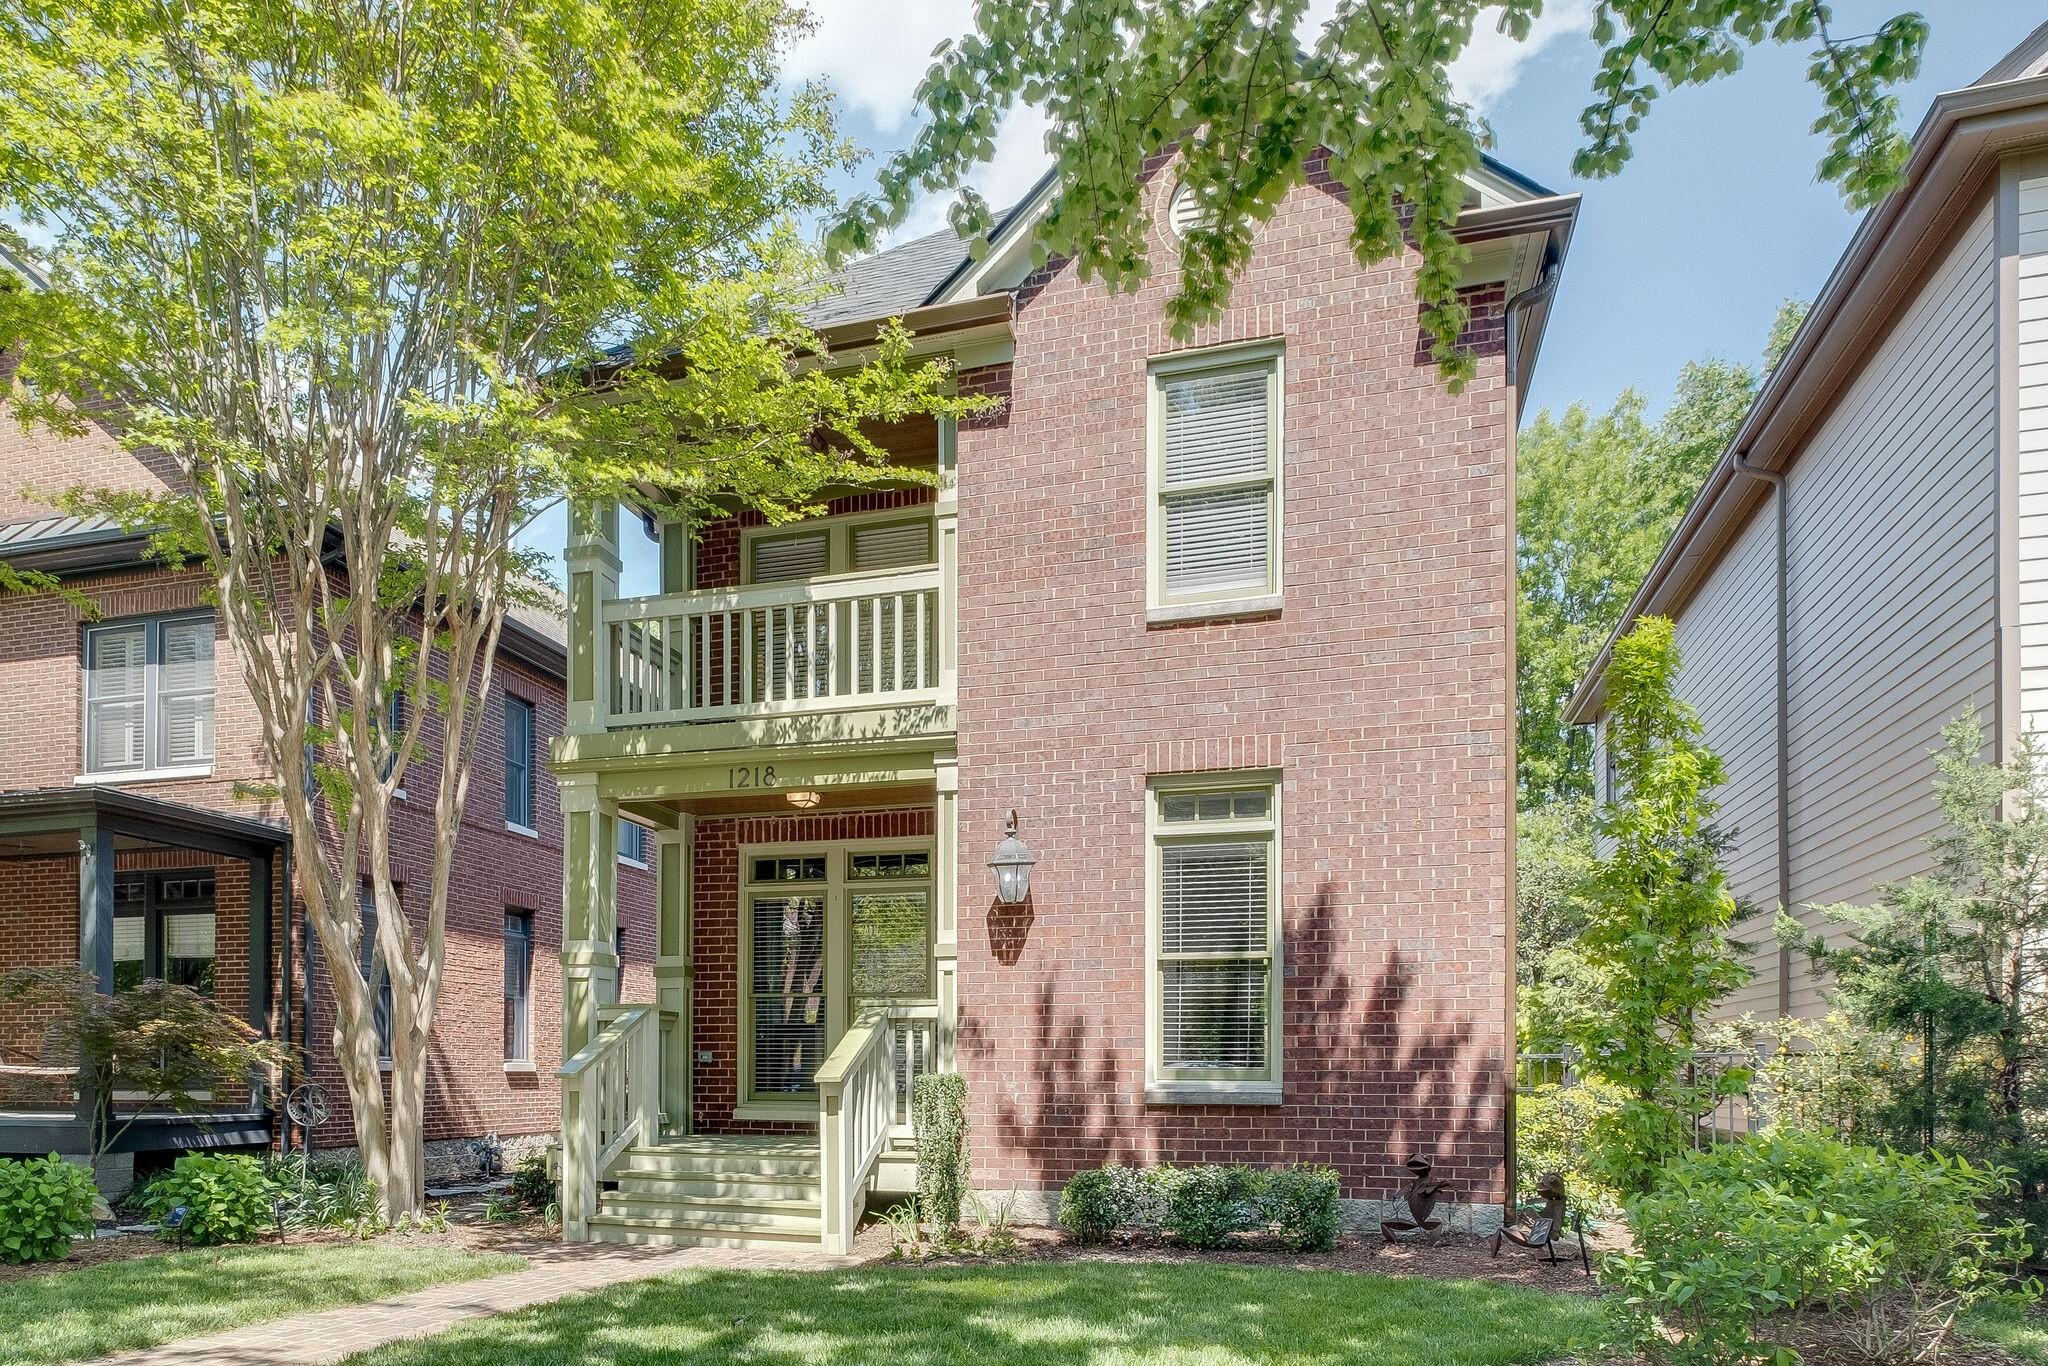 1218 5th Ave N Property Photo - Nashville, TN real estate listing